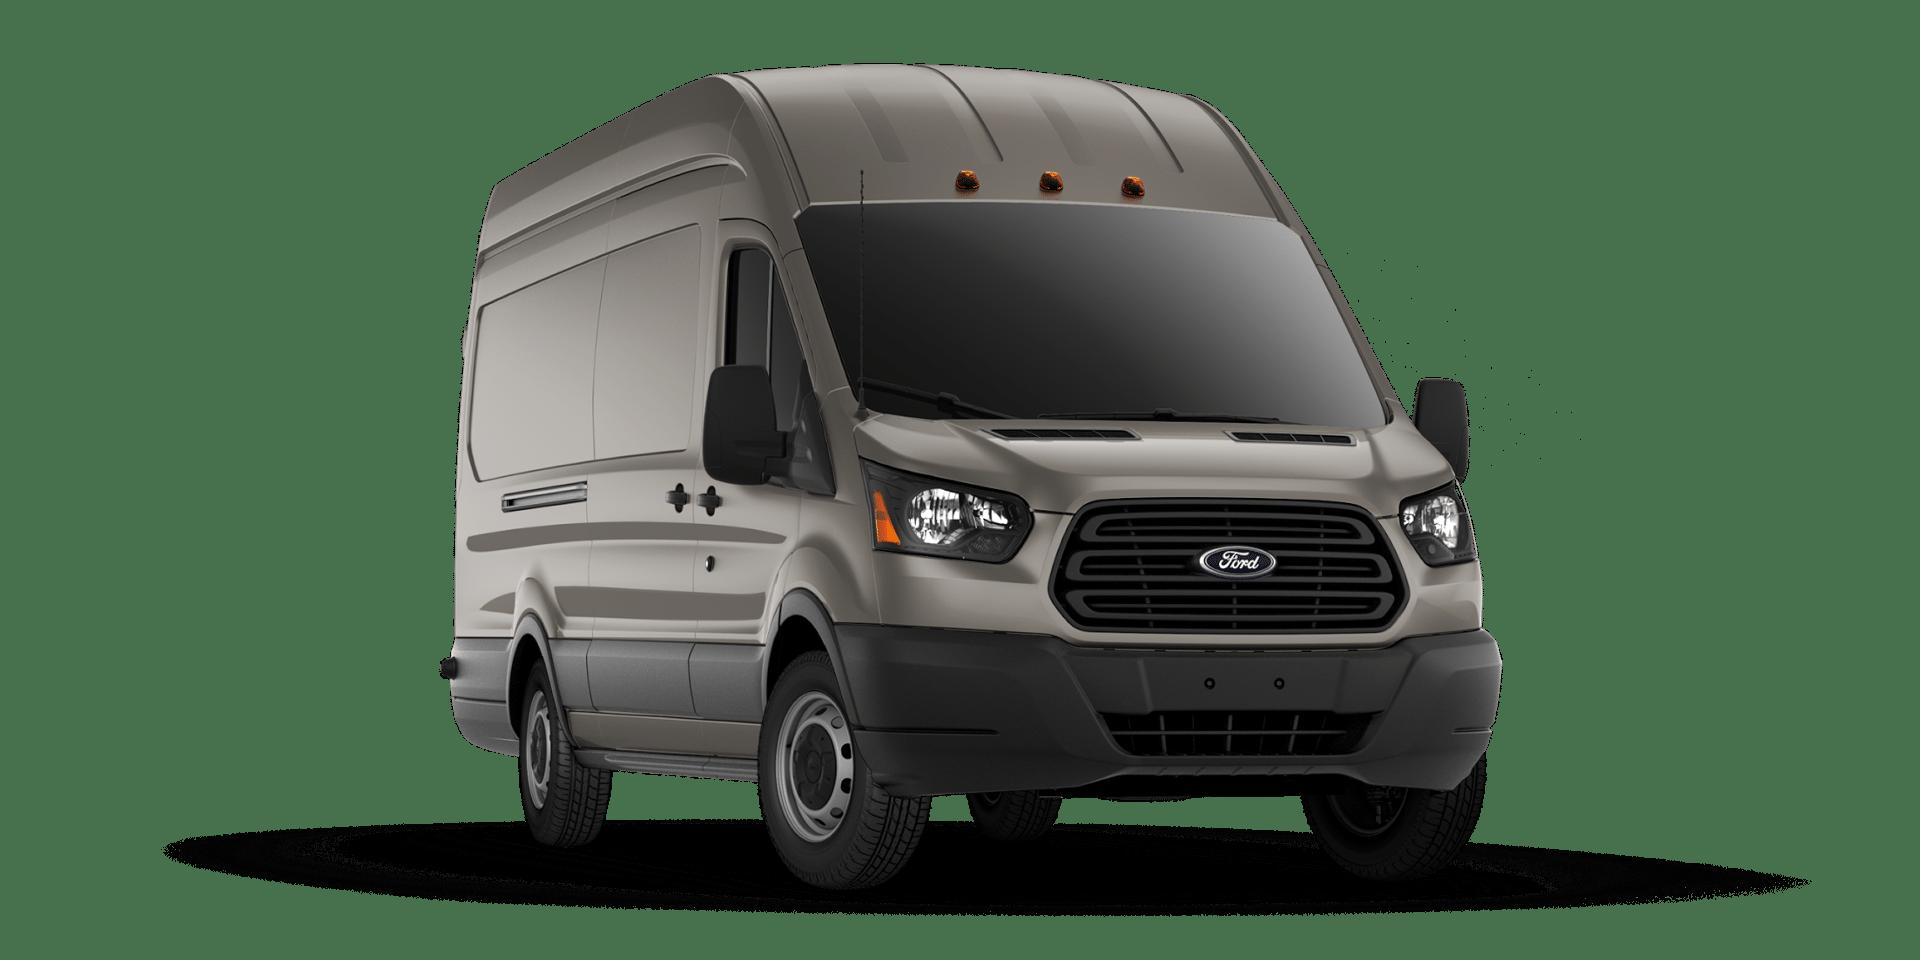 2018 Transit Stone Gray Ford Transit Ford Van Hybrid Car